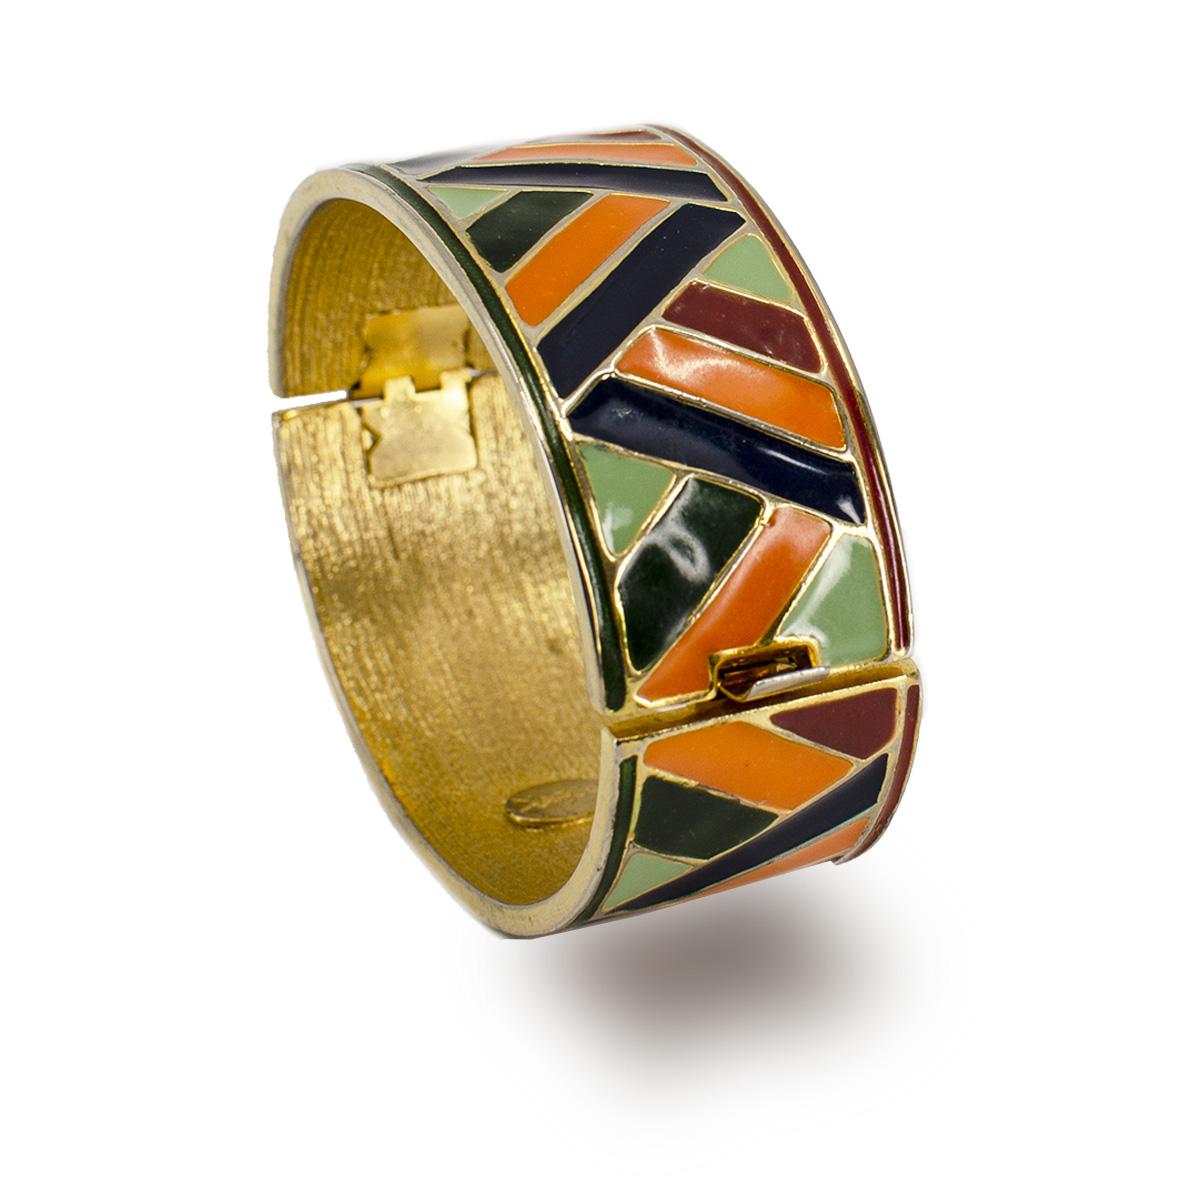 YSL bracelet by Roger Roger Scemama